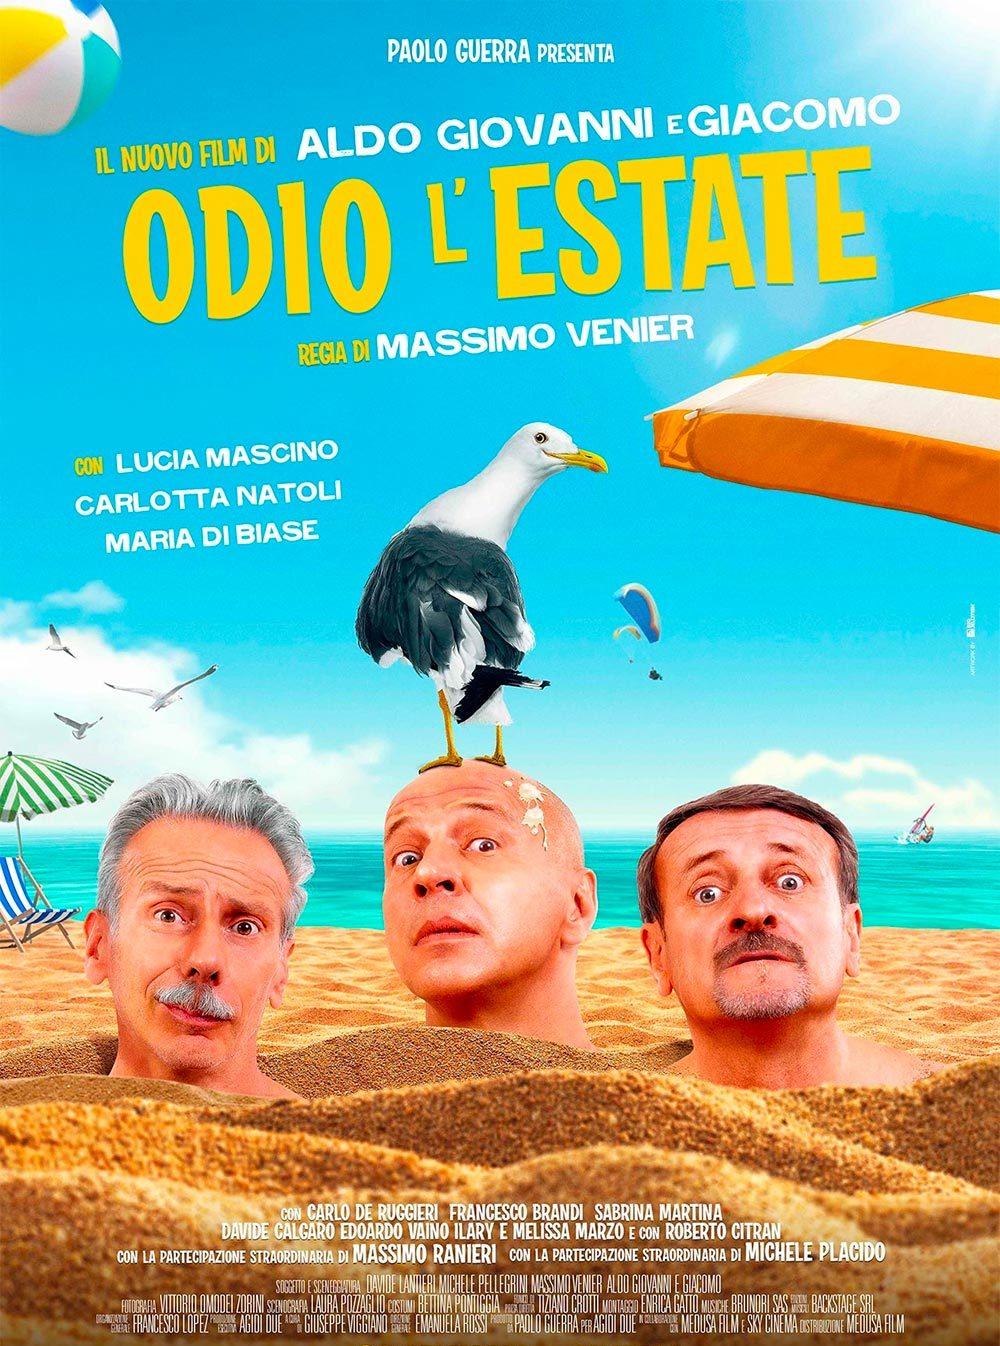 Odio-L-Estate-Cinema-Elios-Carmagnola-Cinema-Sotto-Le-Stelle-Cinema-Estivo